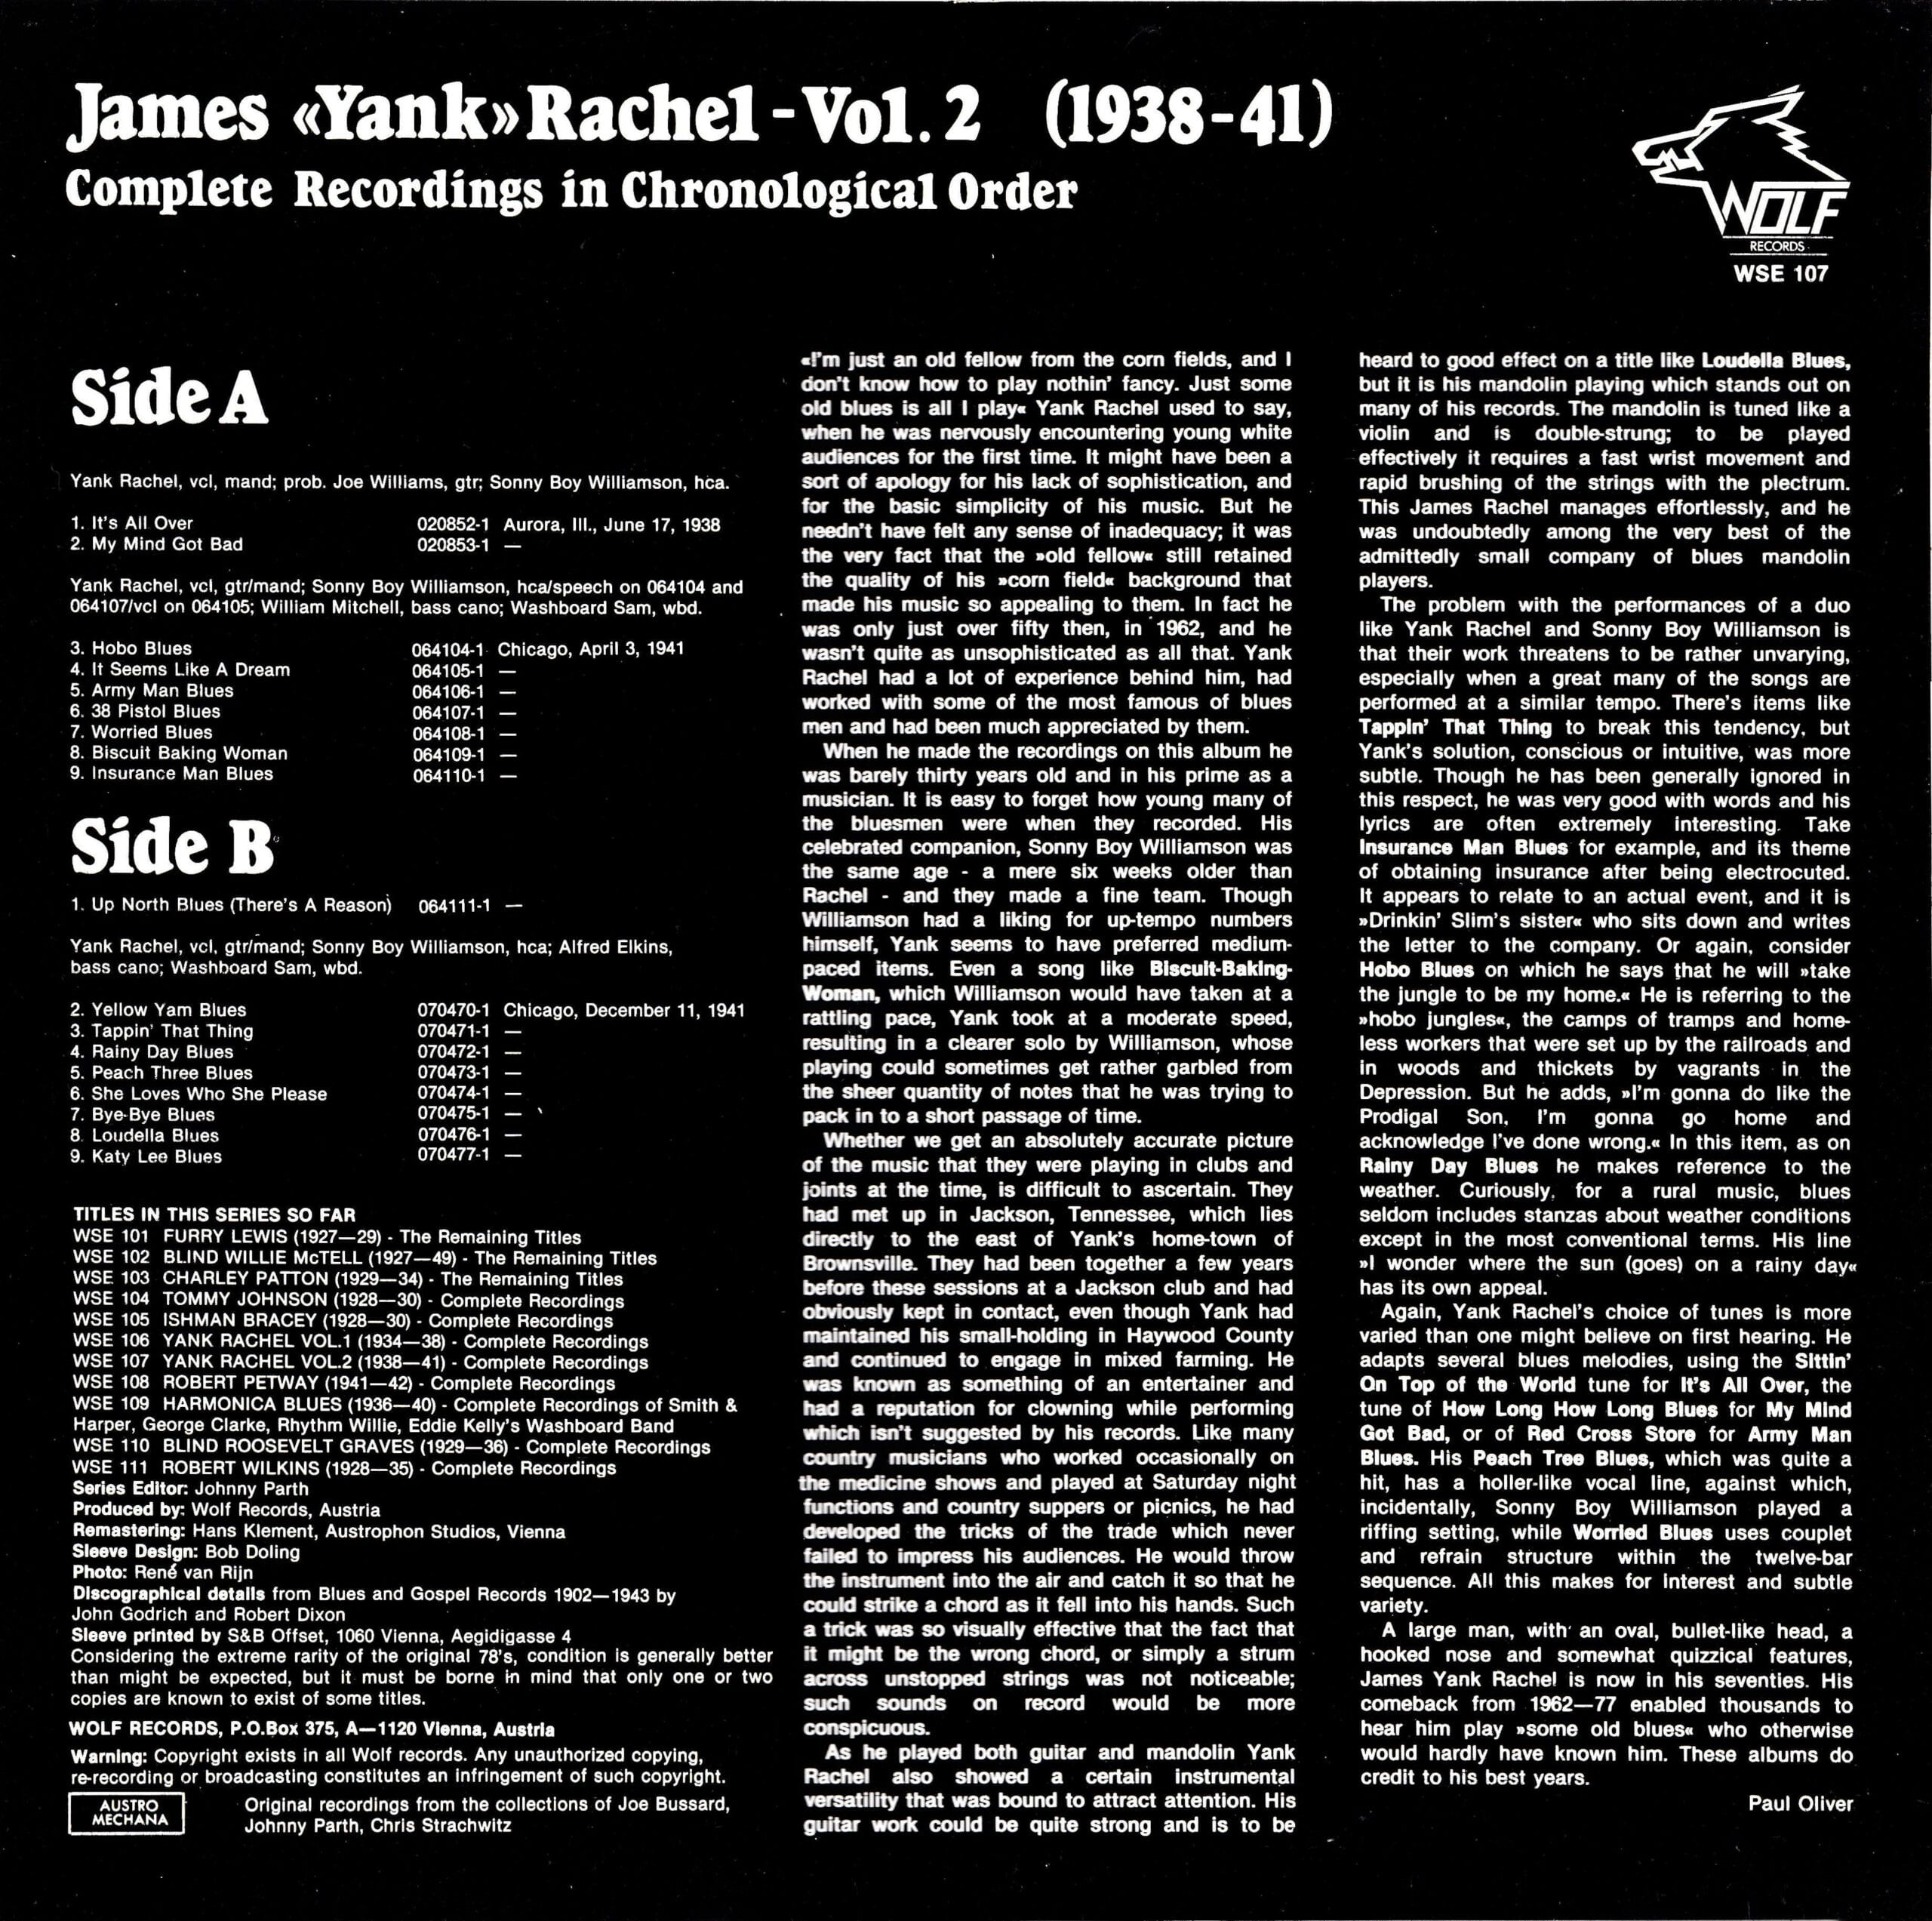 James Yank Rachel, Vol. 2 – 2